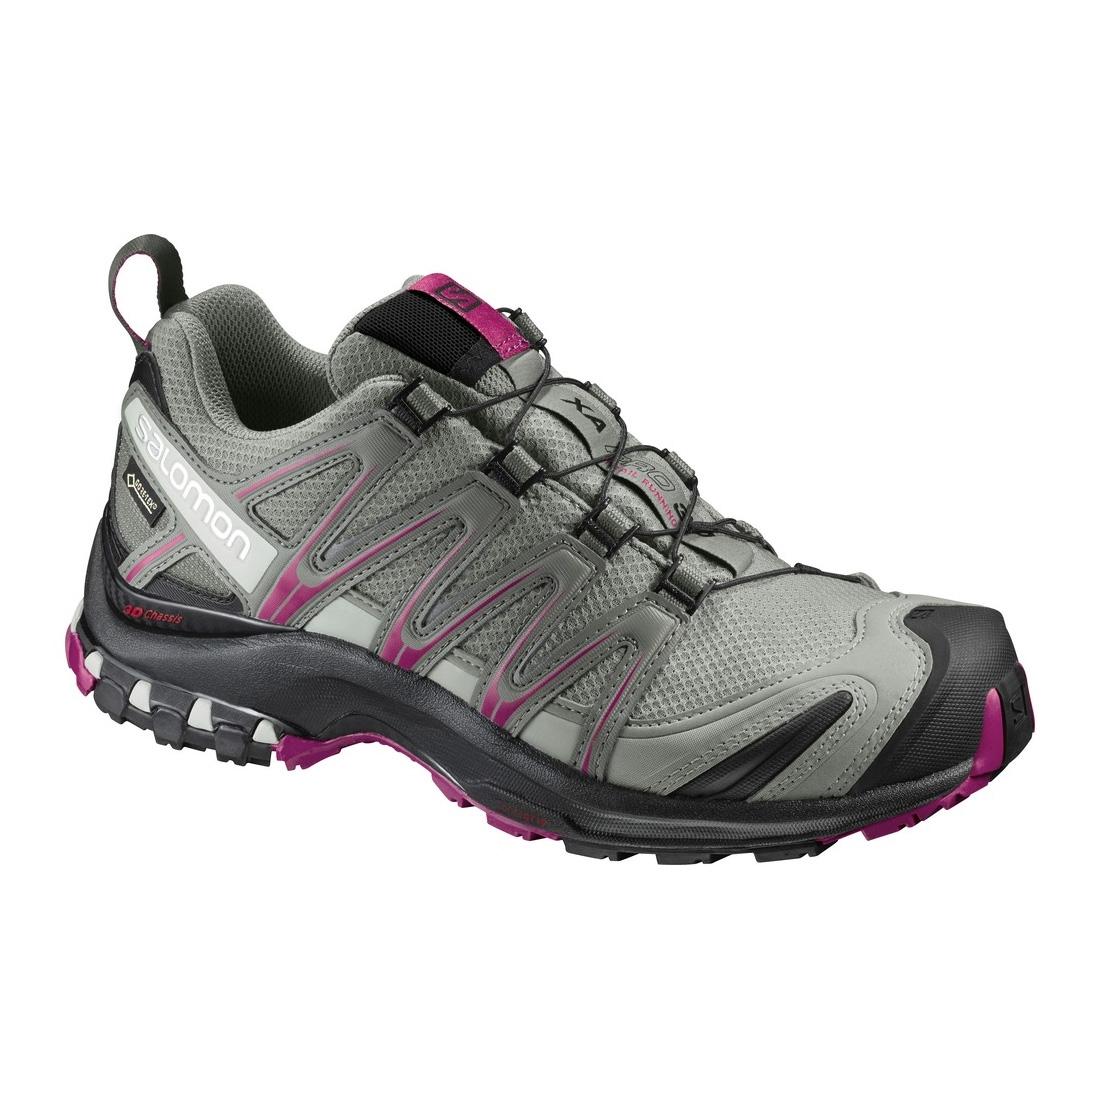 Salomon XA Pro 3D GTX Walking Shoes